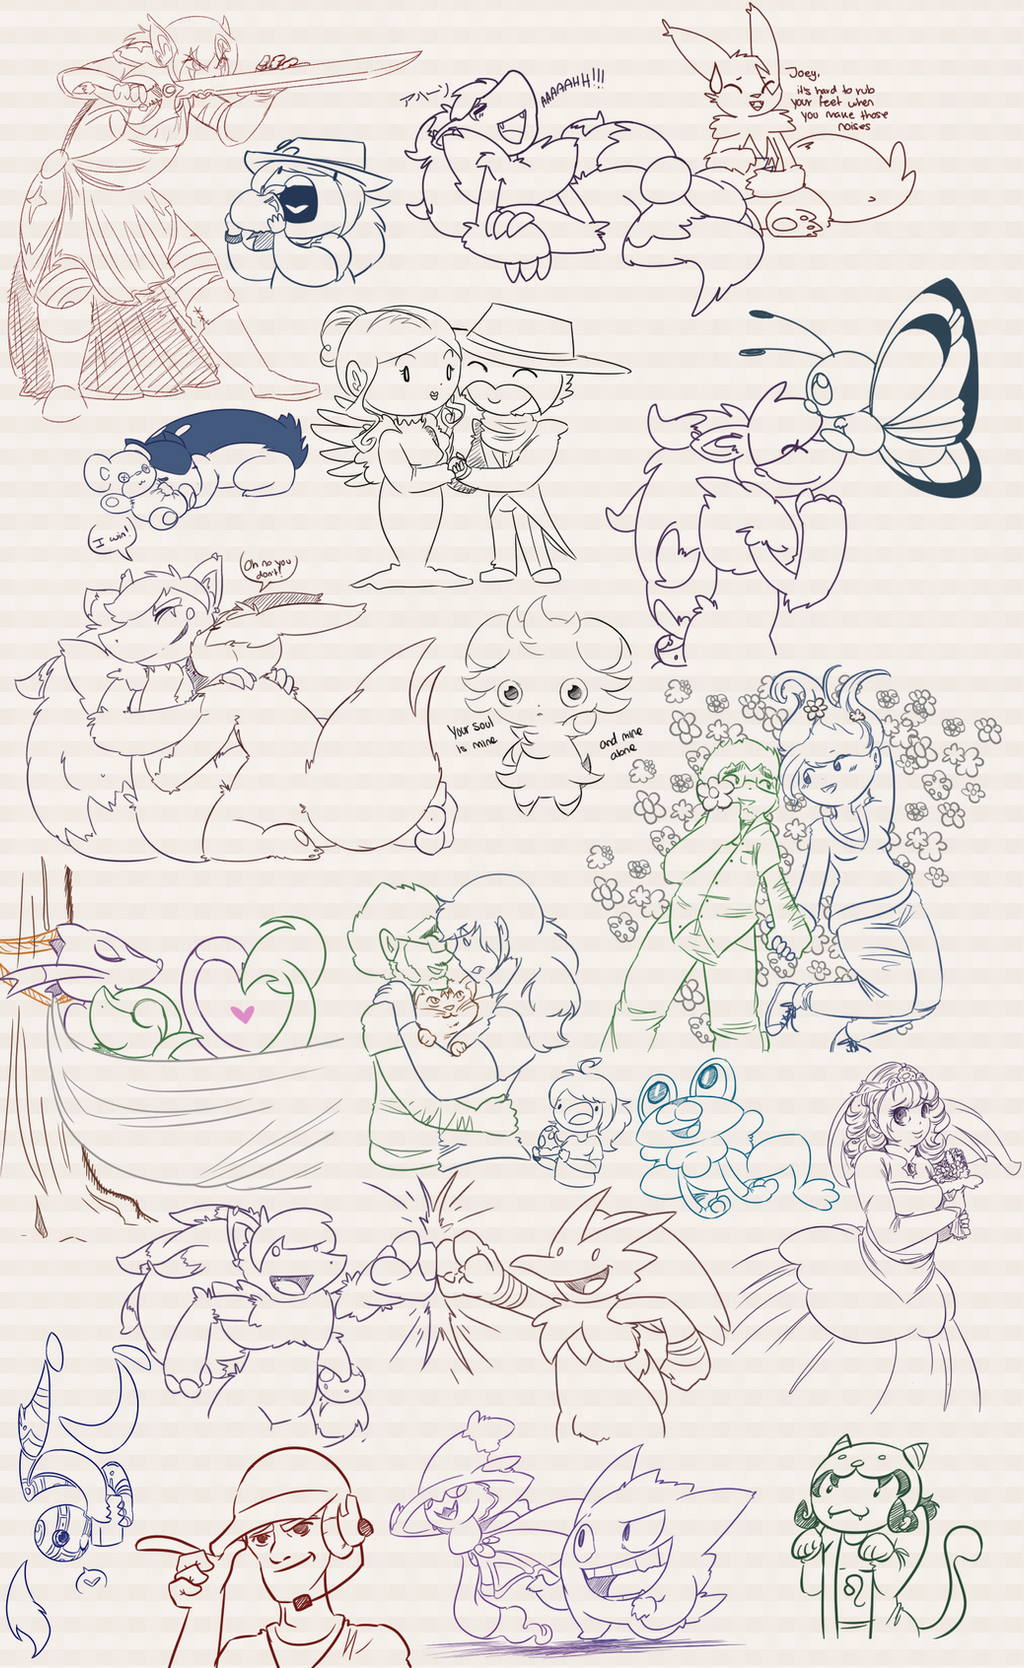 Doodle Dumps 24 by Dipschtick